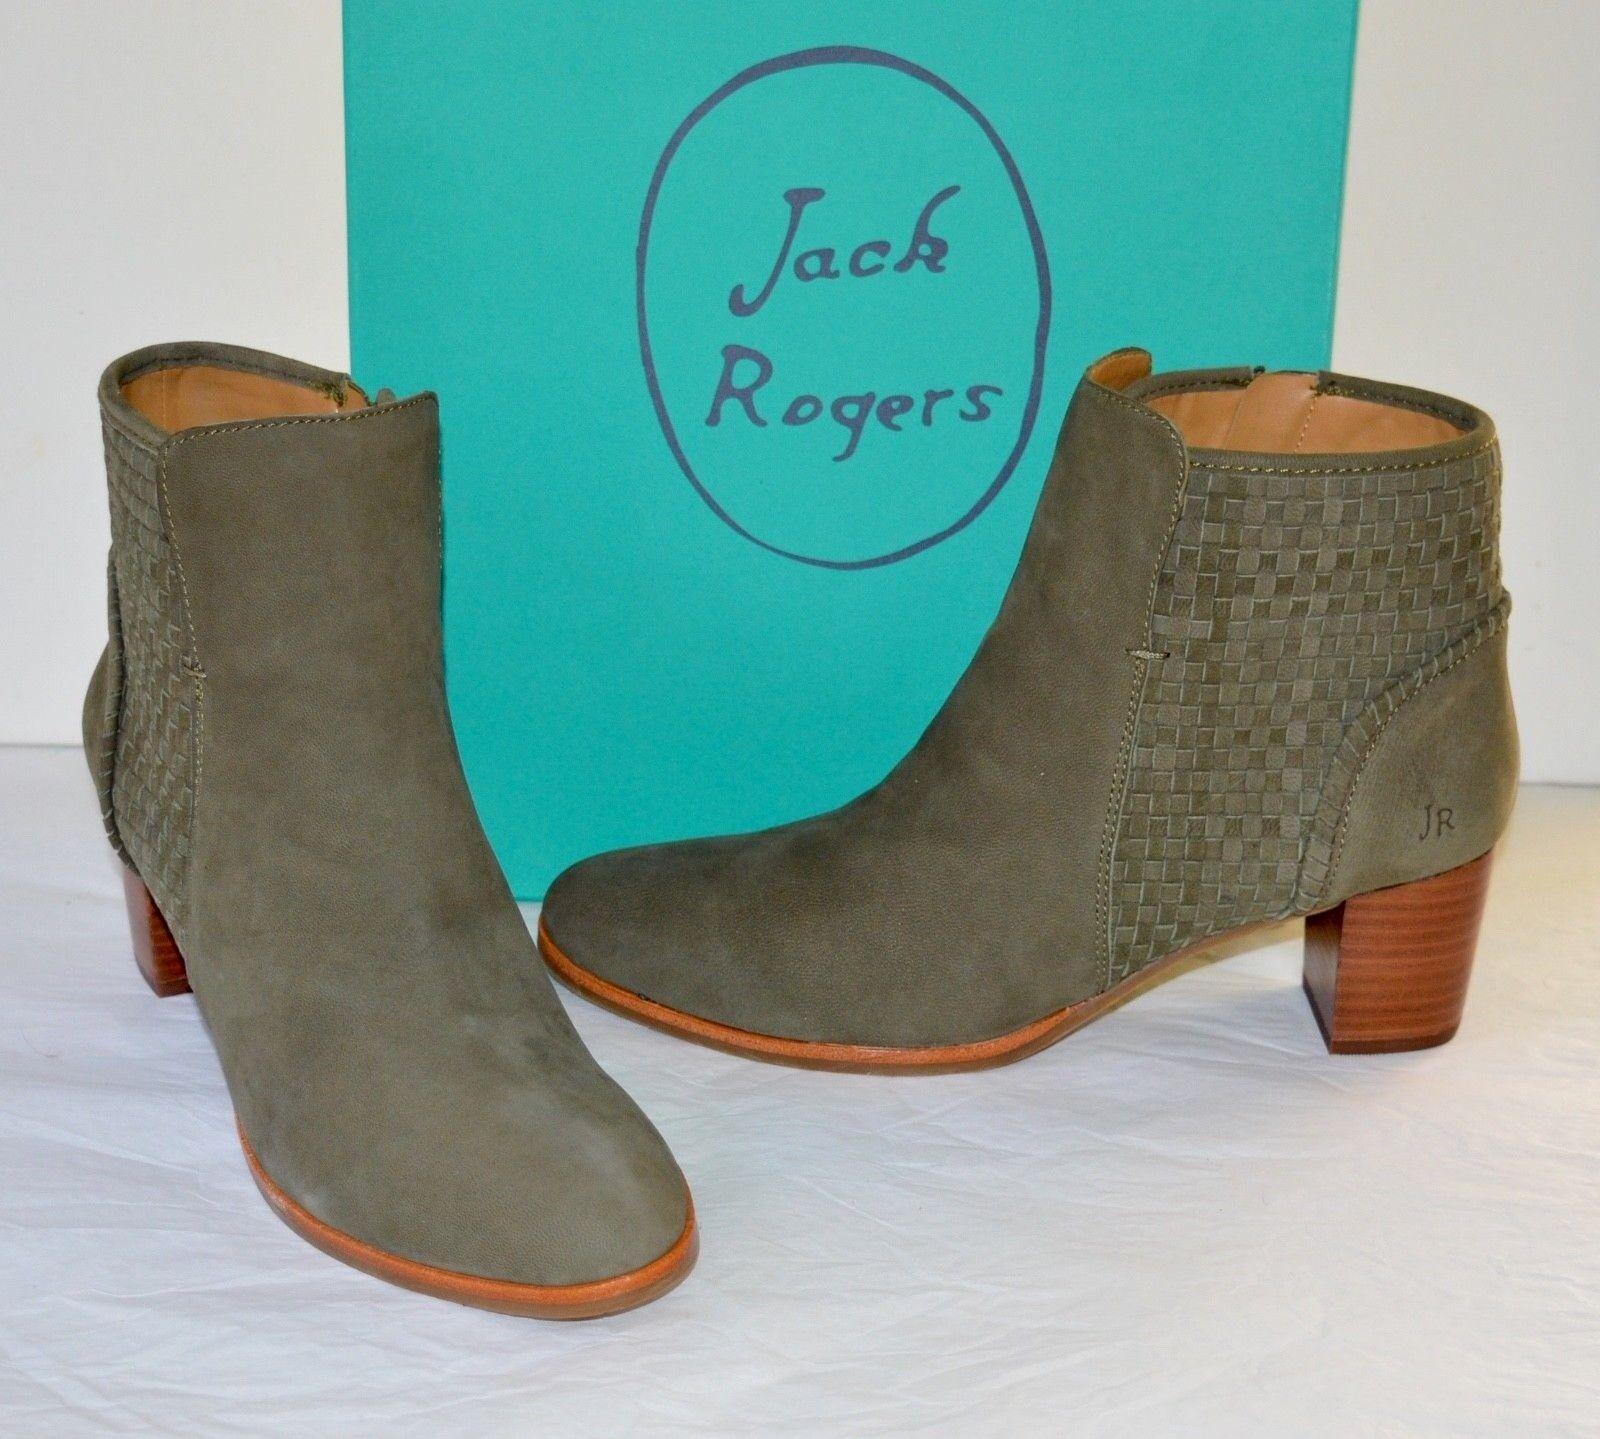 per offrirti un piacevole shopping online New  168 Jack Rogers Deborah Olive Olive Olive verde Suede Ankle stivali avvioie Woven Short  l'intera rete più bassa